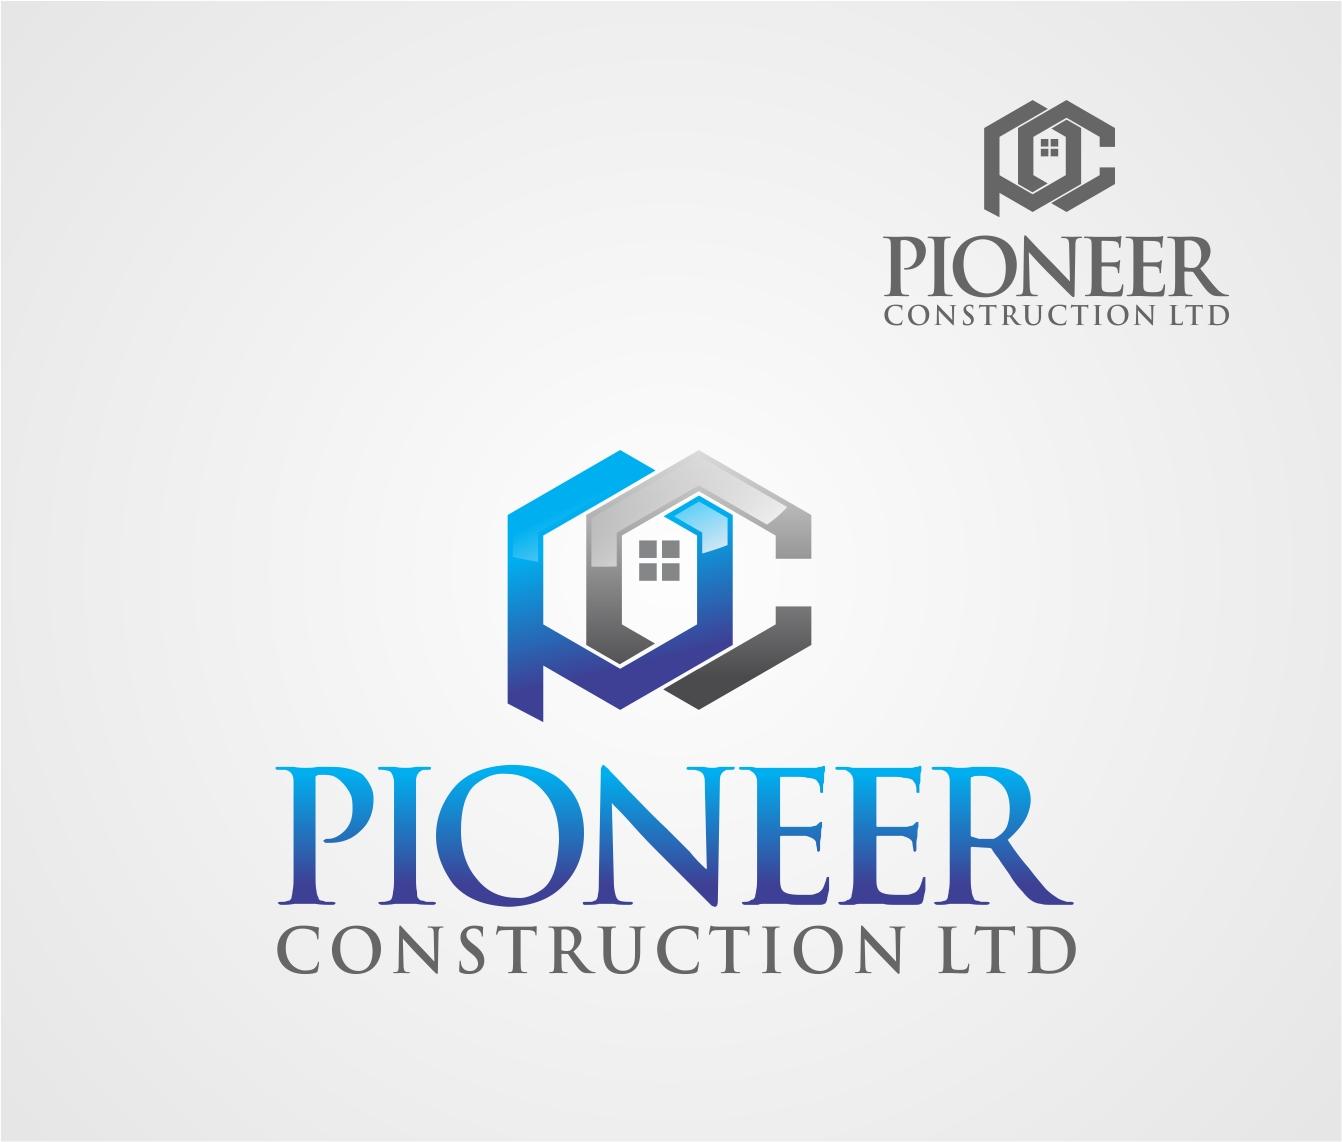 Logo Design by Reivan Ferdinan - Entry No. 3 in the Logo Design Contest Imaginative Logo Design for  Pioneer Construction Ltd.